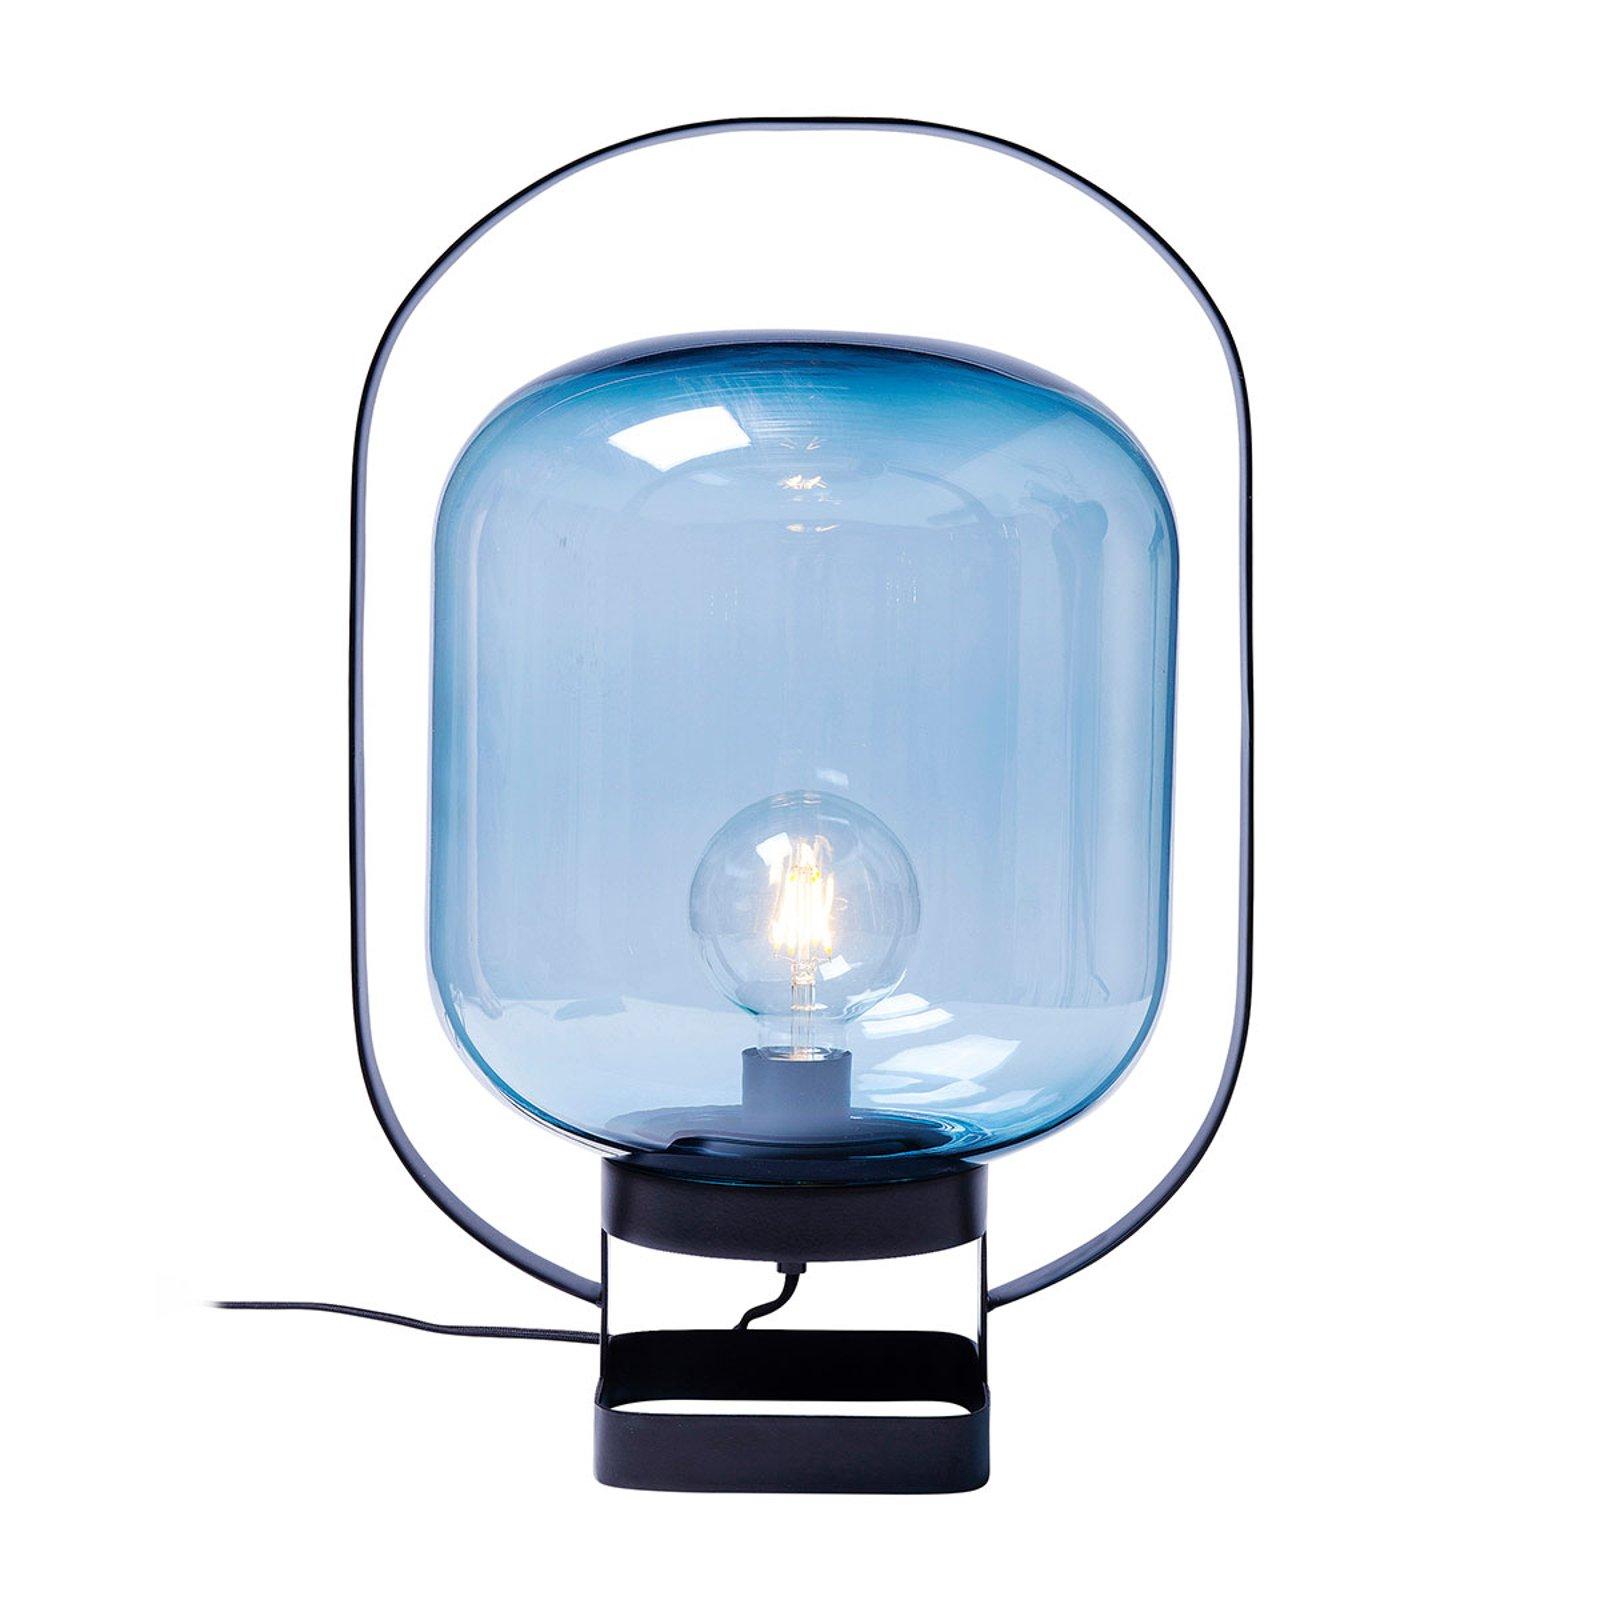 KARE Jupiter Retro bordlampe, blå-svart